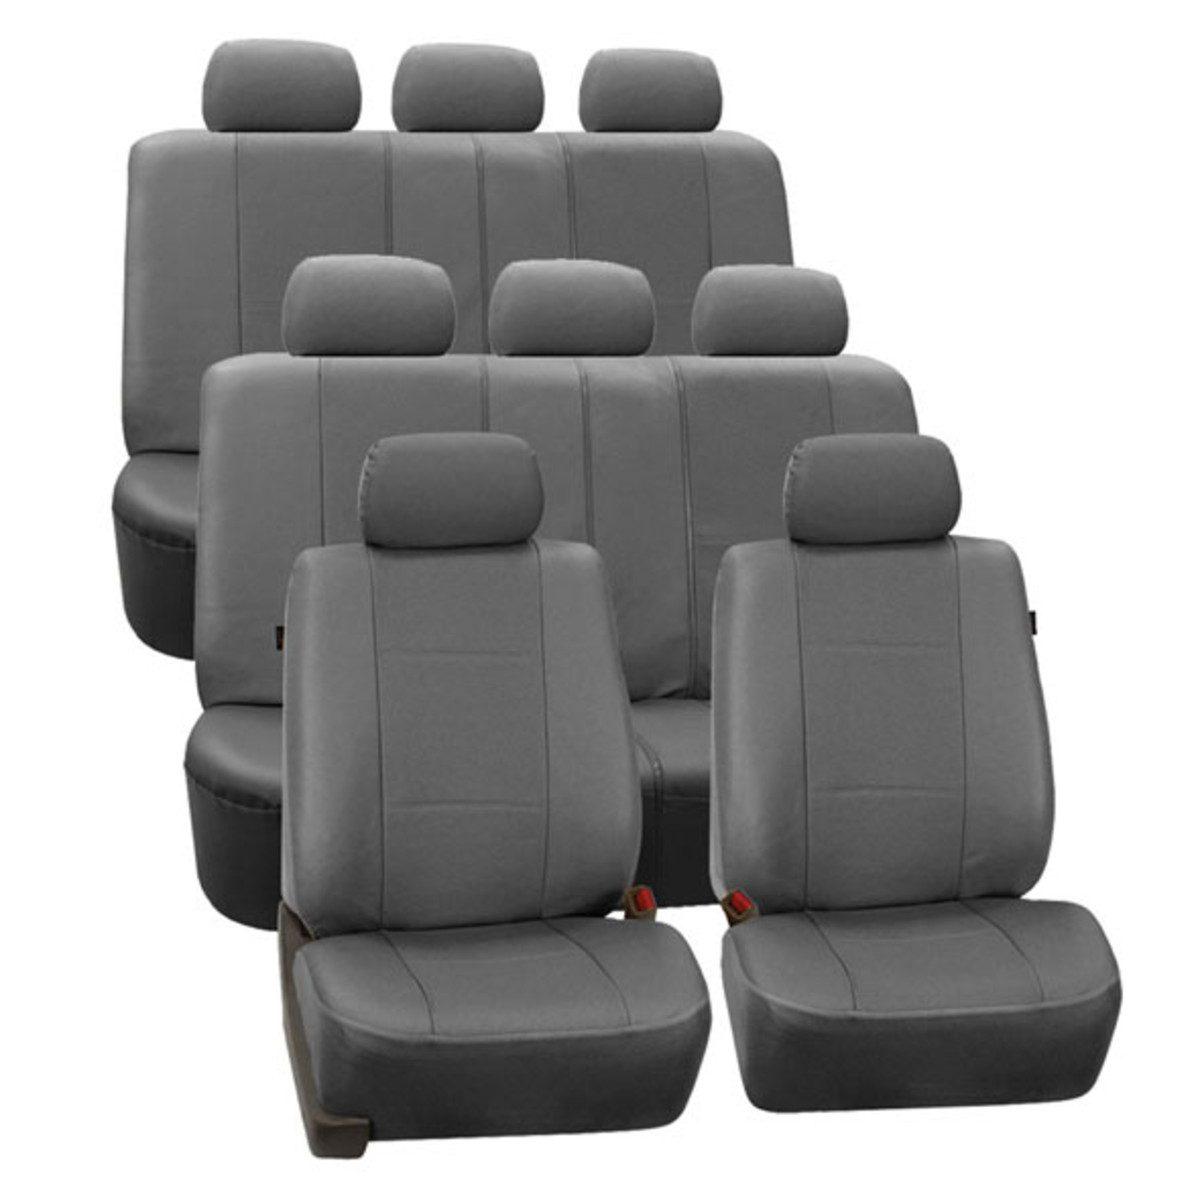 88-PU007128GRAY_gray seat cover 1